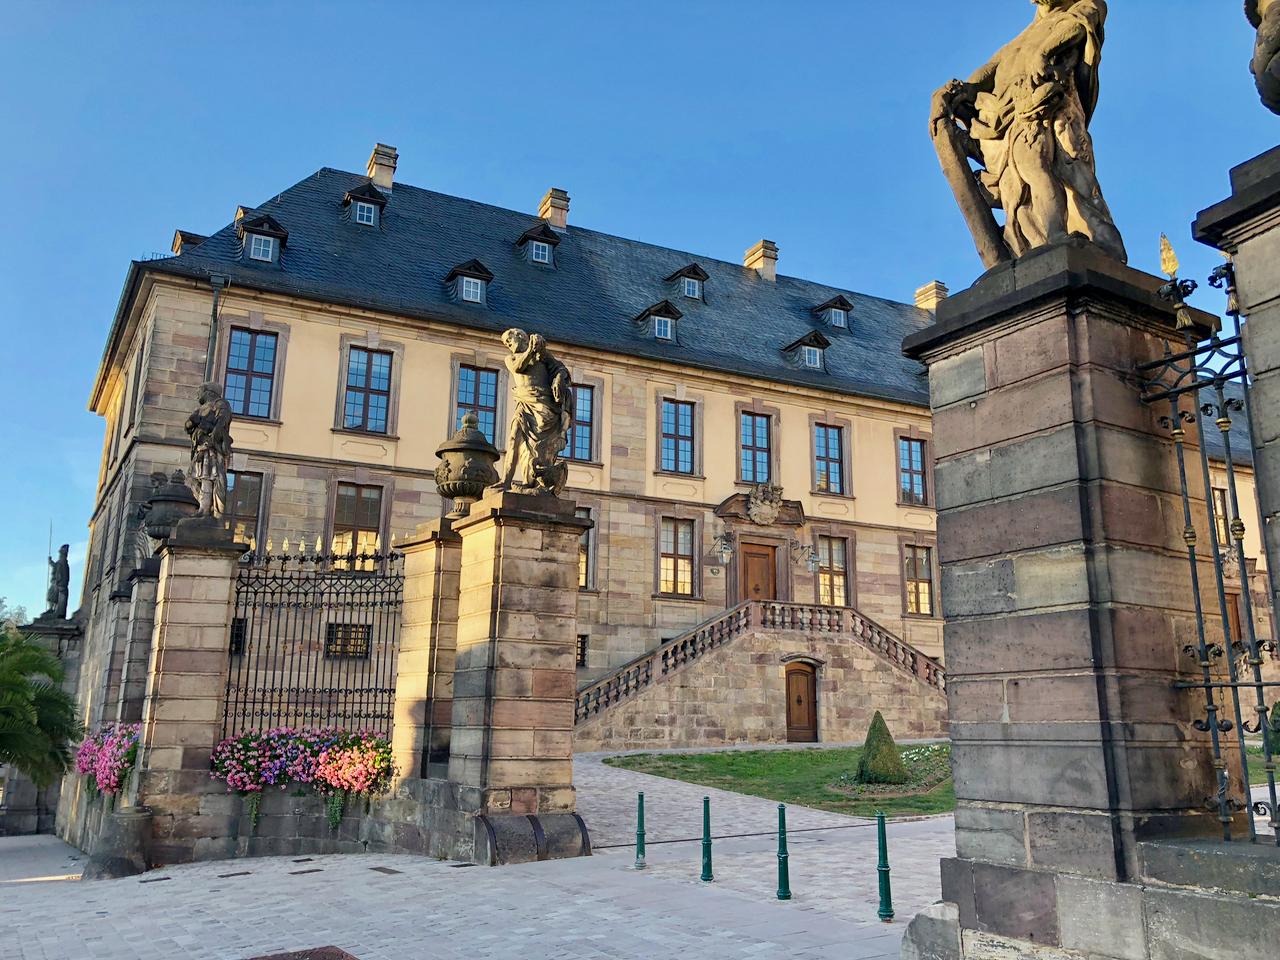 Wochenende in Fulda – Fulda Schloss